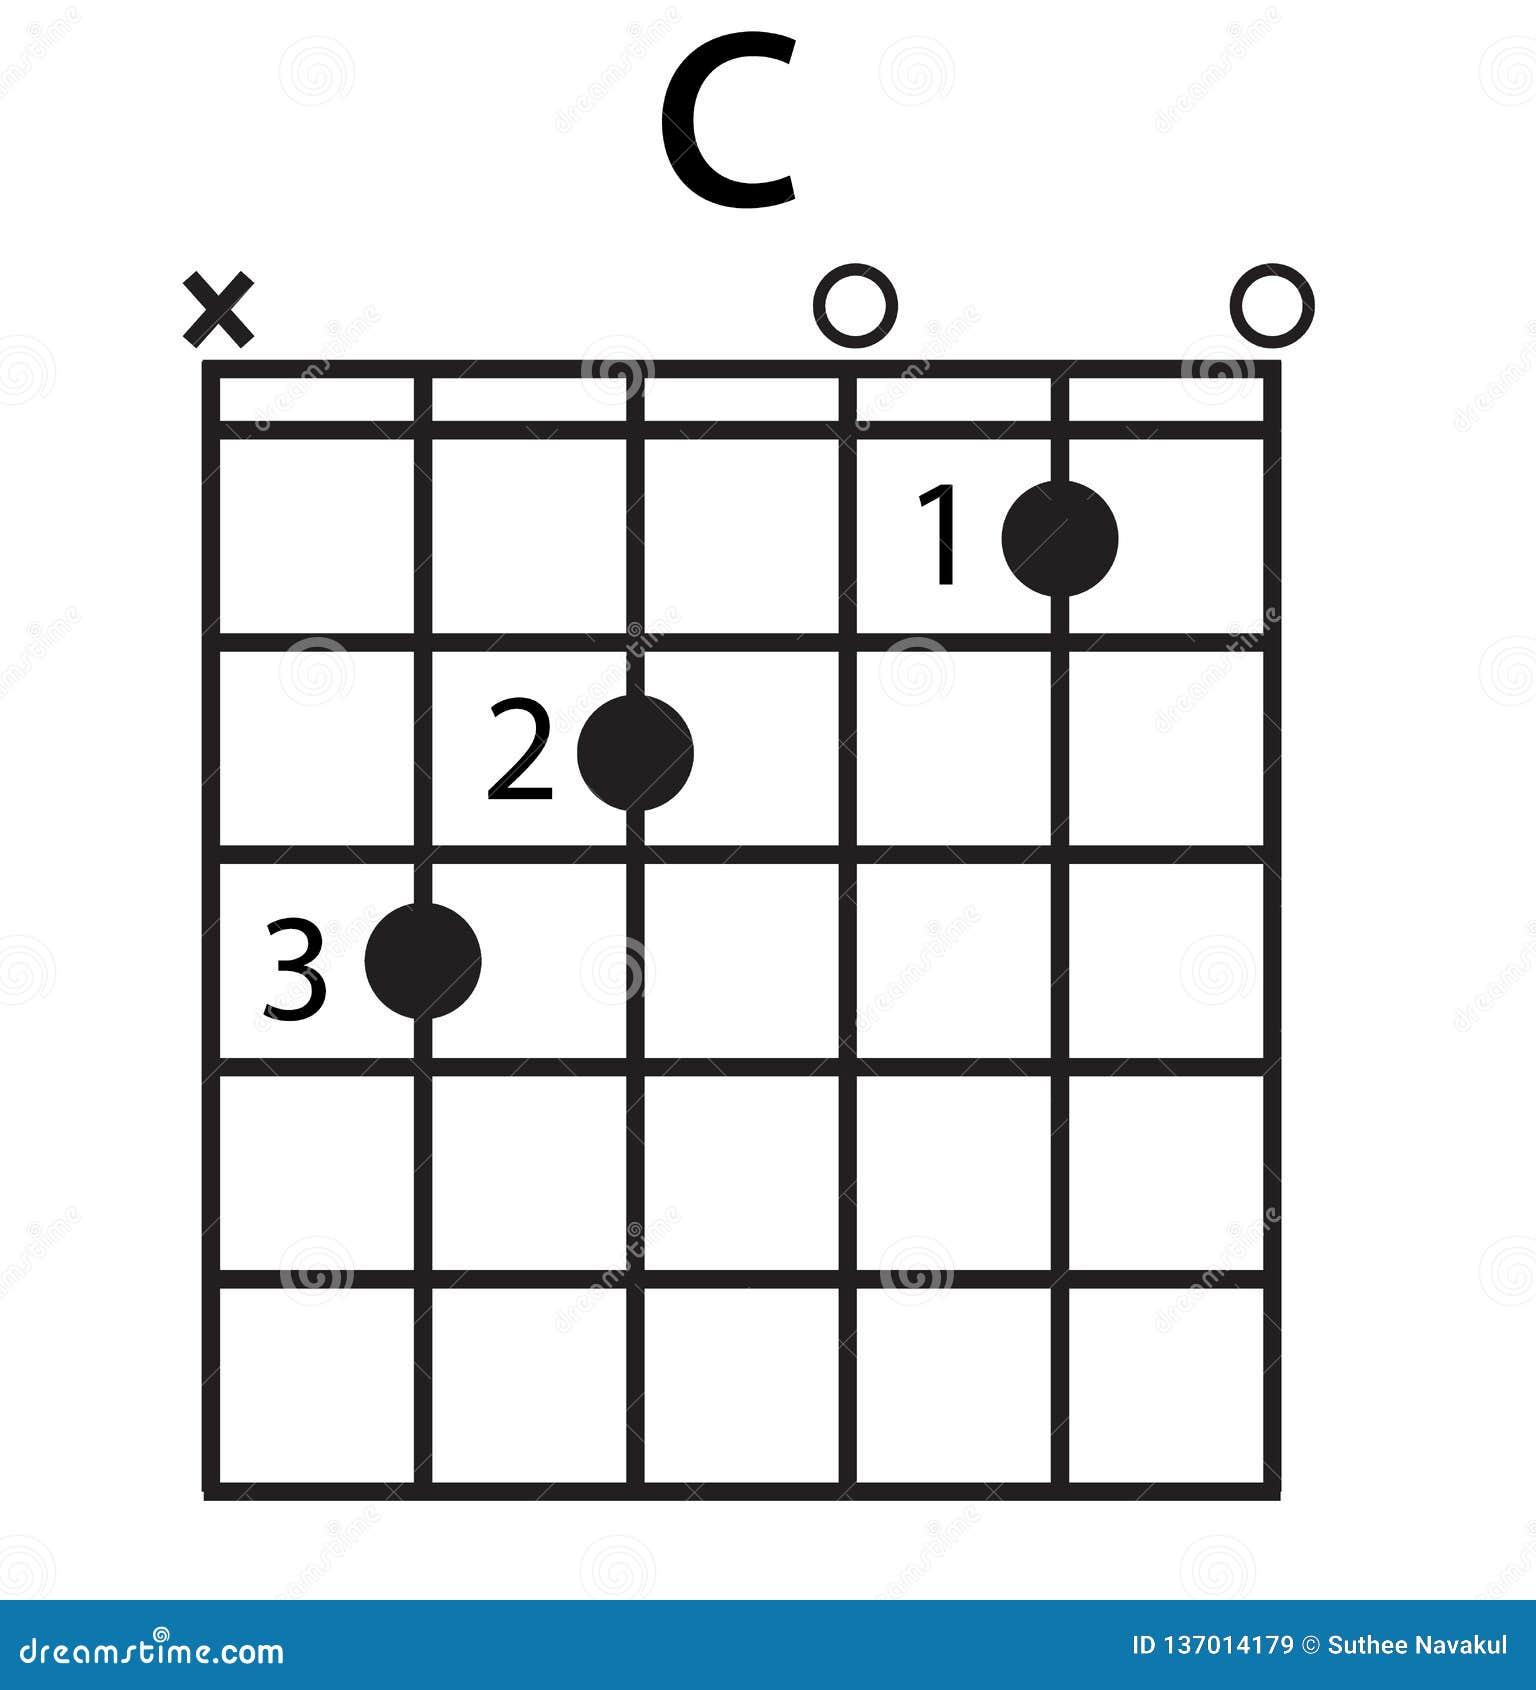 C Chord Diagram on White Background. Flat Style. Finger Chart Icon ...